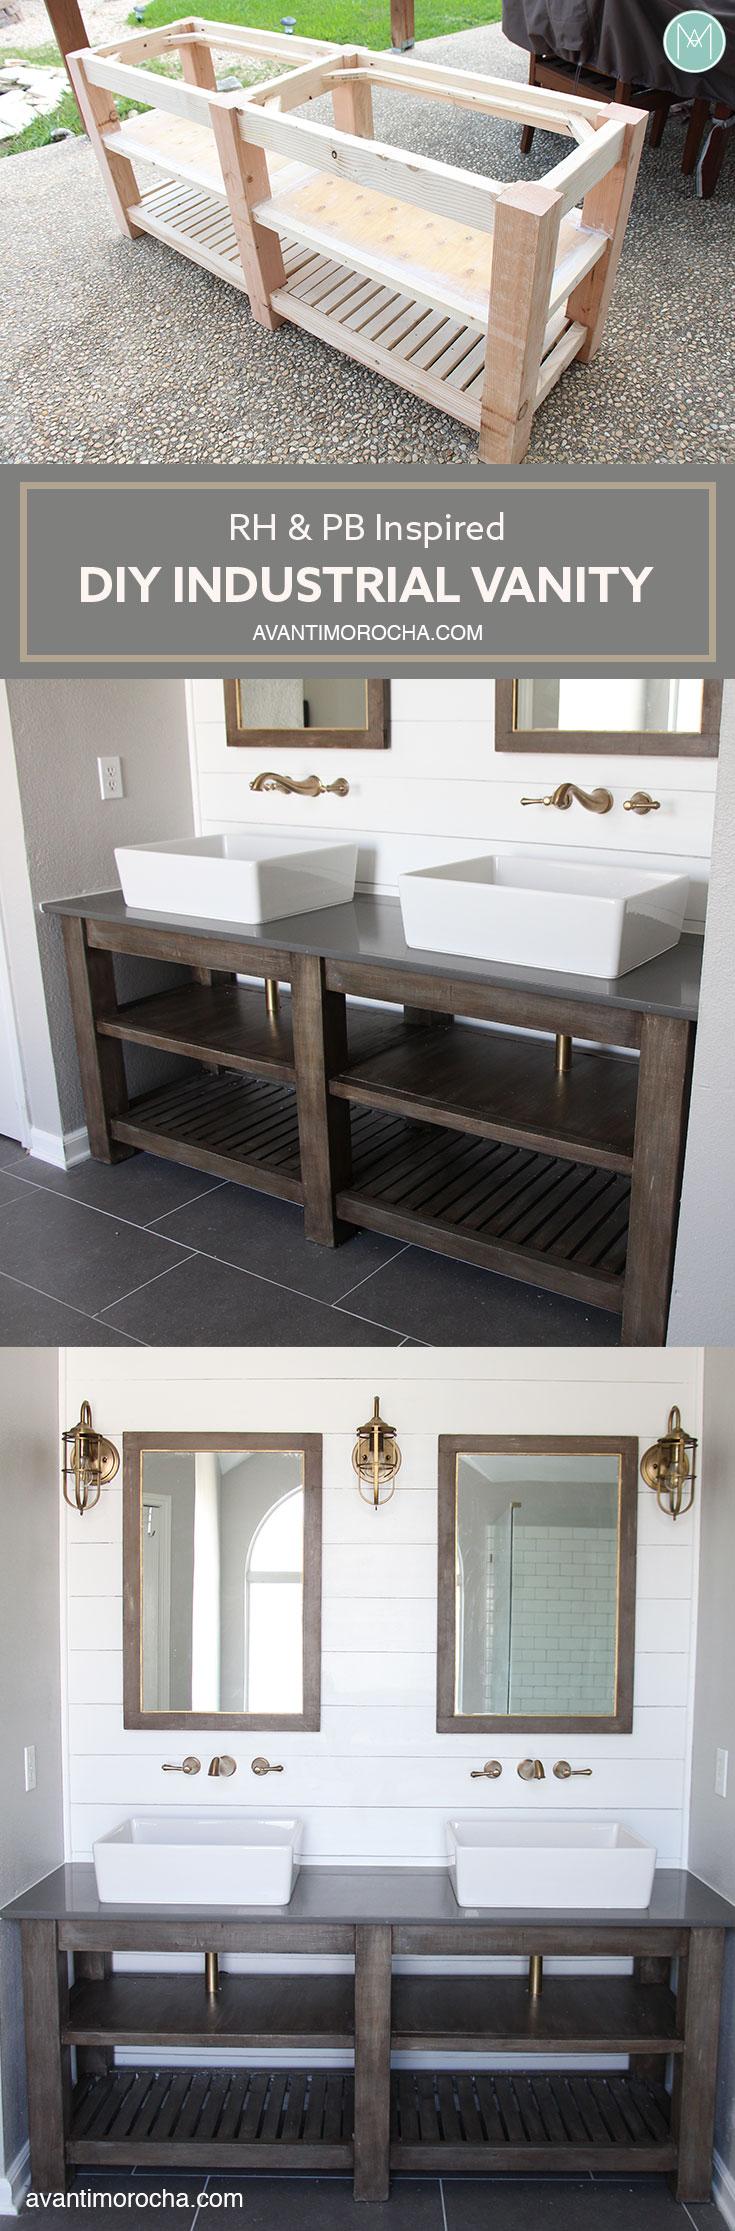 Diy Industrial Bathroom Vanity Avanti Morocha # Muebles Do It Yourself